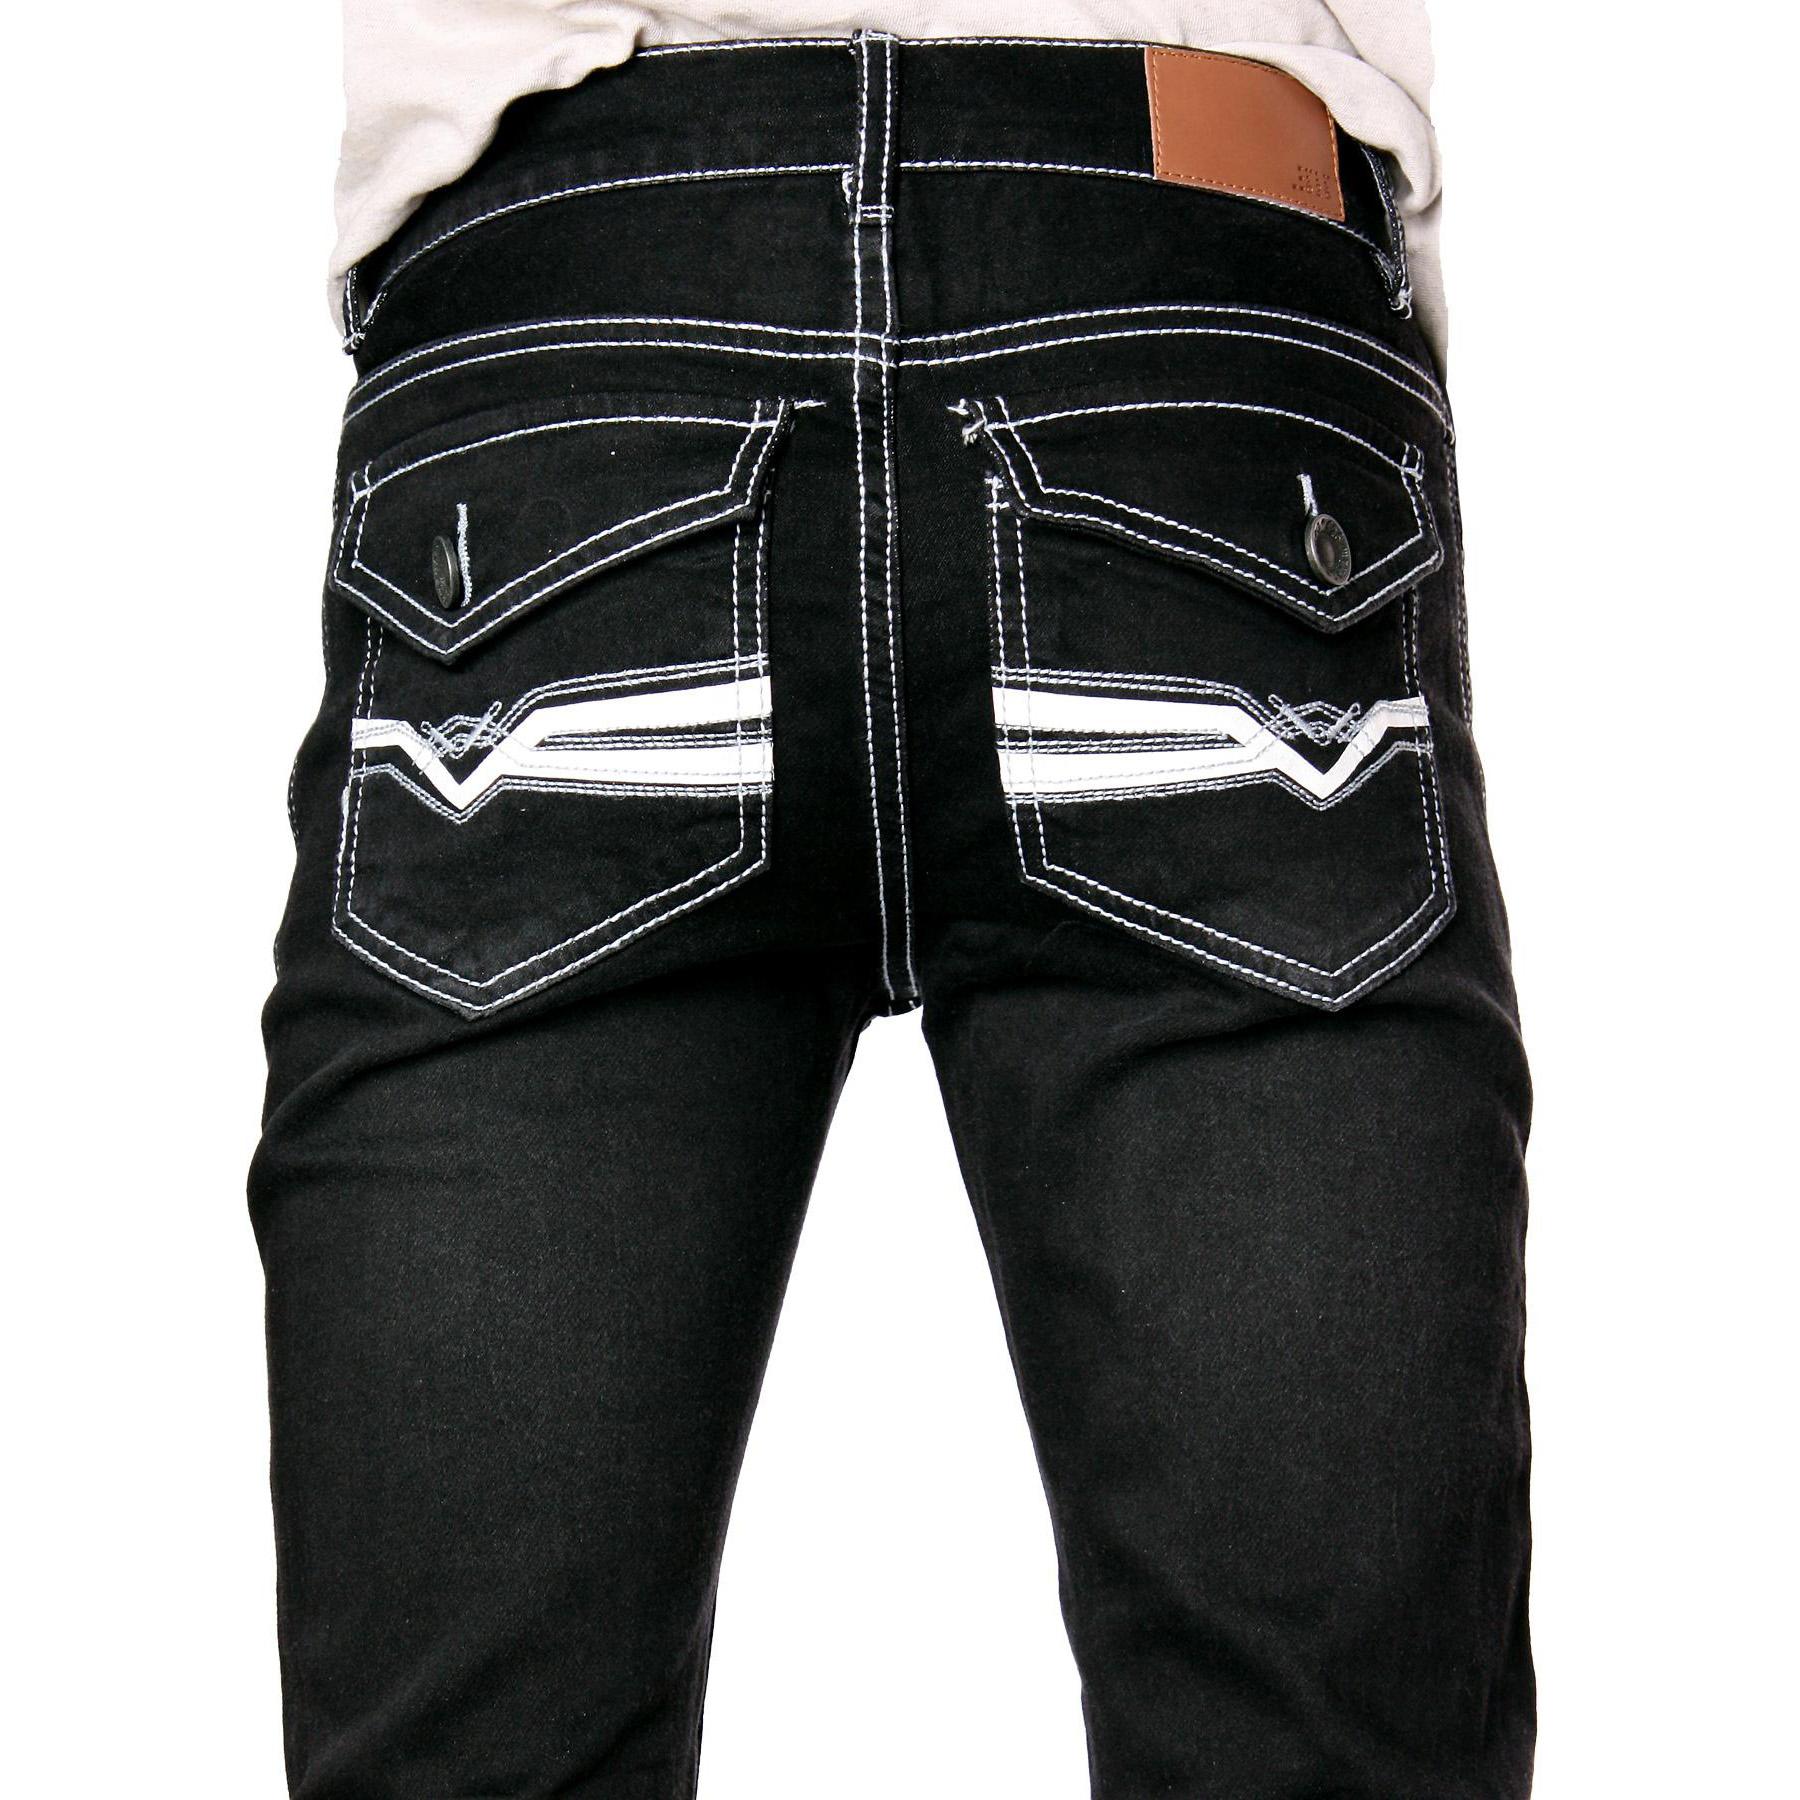 Mens Jeans Slim Fit